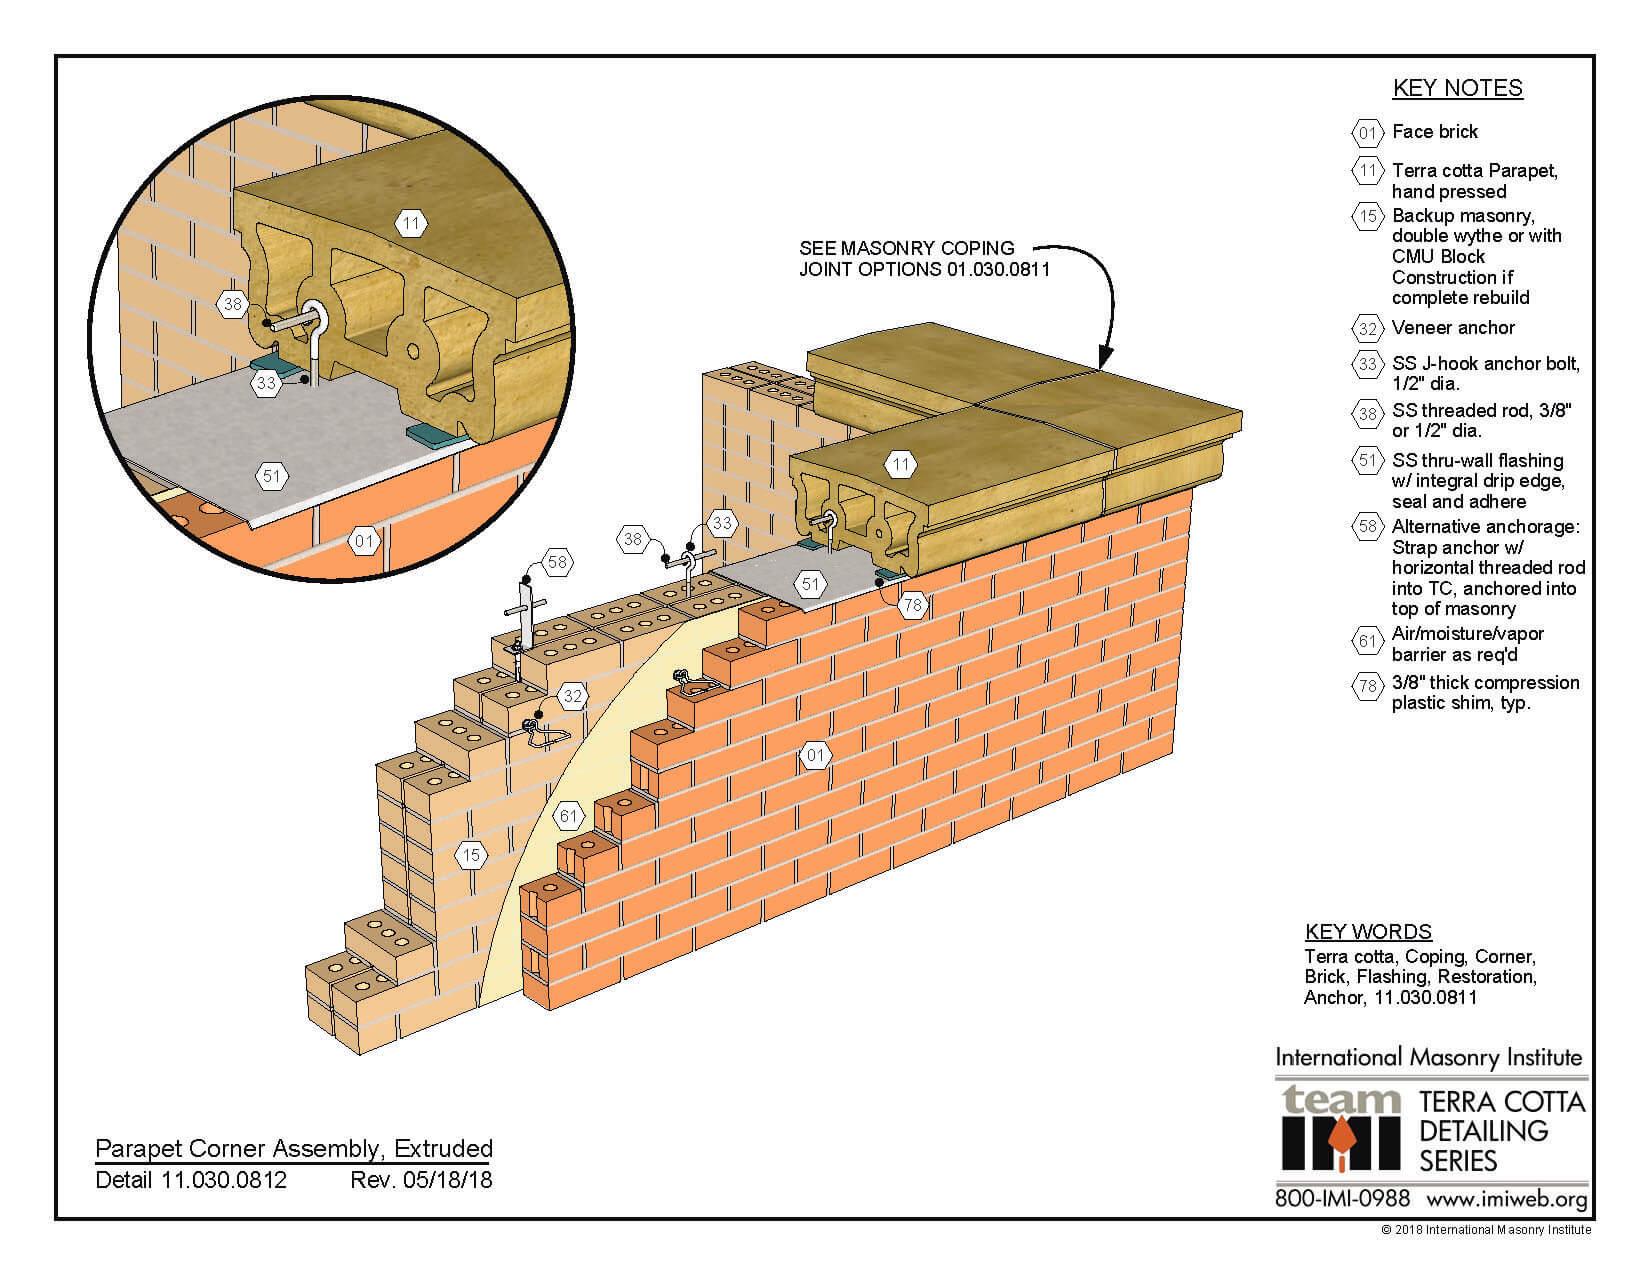 11 030 0811 Parapet Corner Assembly Extruded